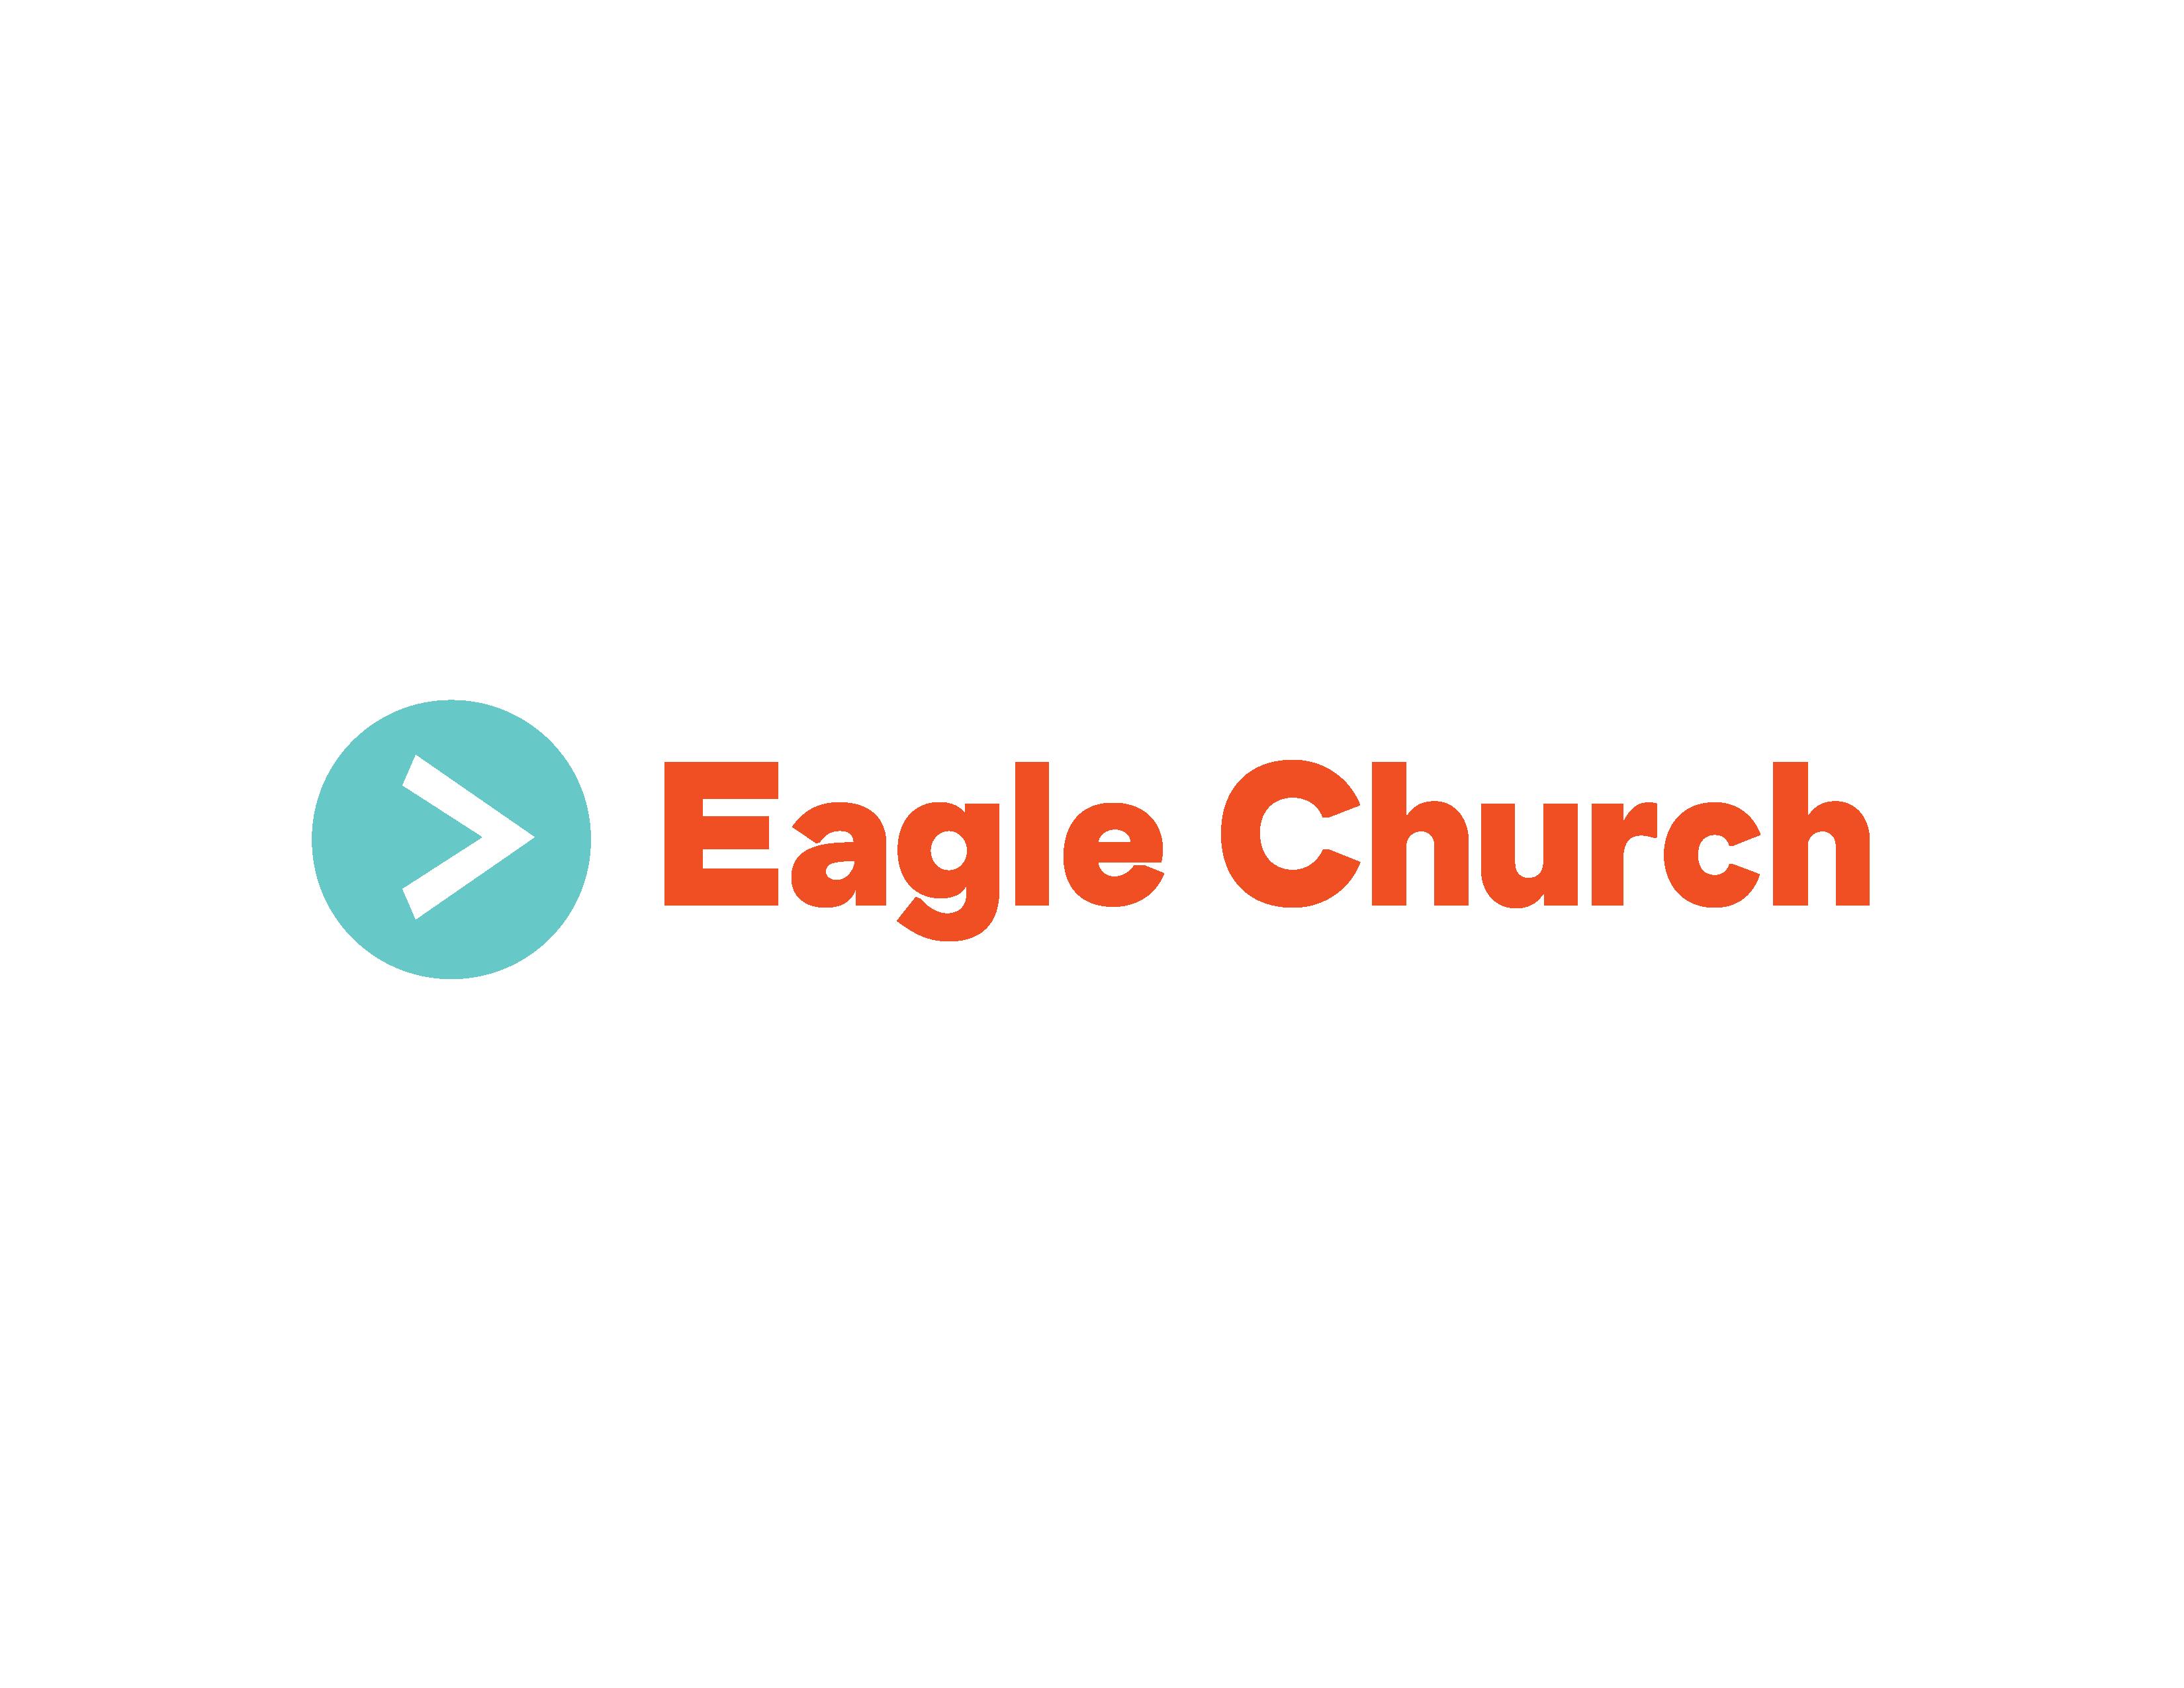 Eagle Church